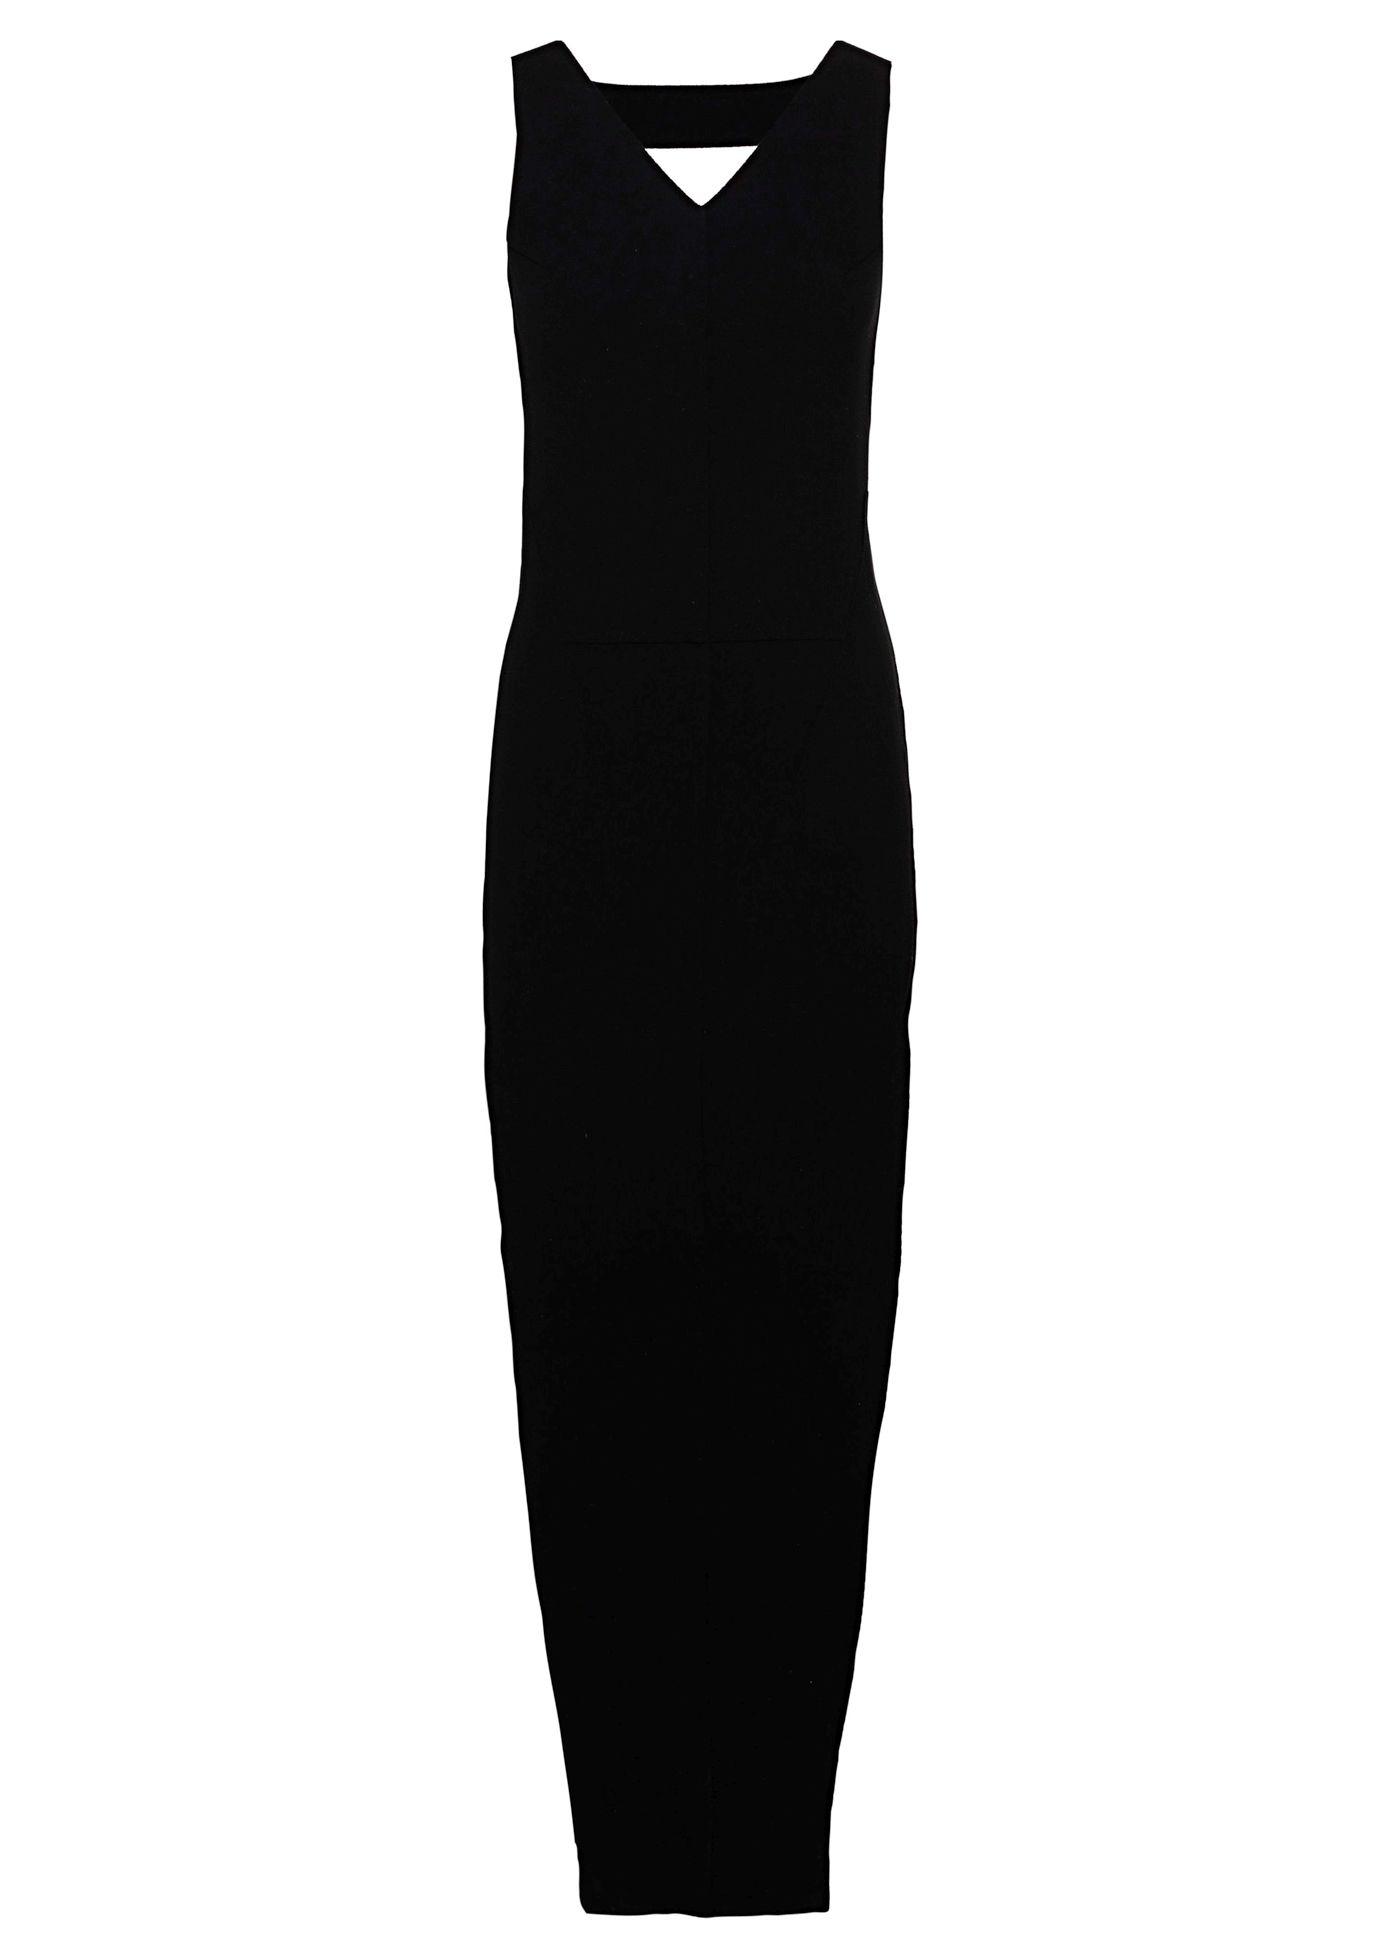 ABITO IN MAGLIA - V DRESS image number 0